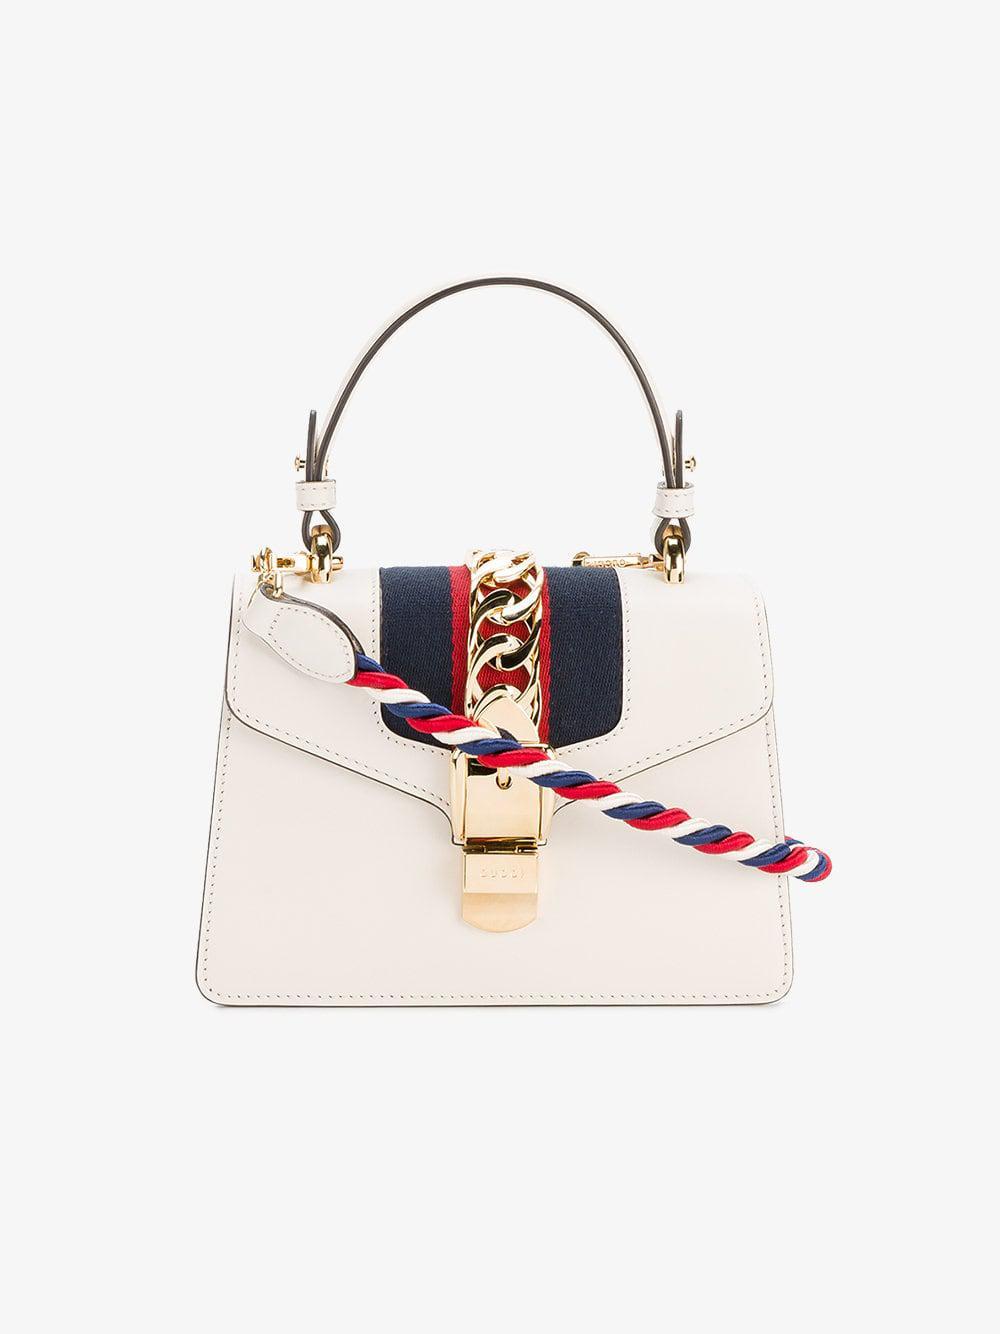 468c2da3d30942 Lyst - Gucci Sylvie Leather Shoulder Bag in White